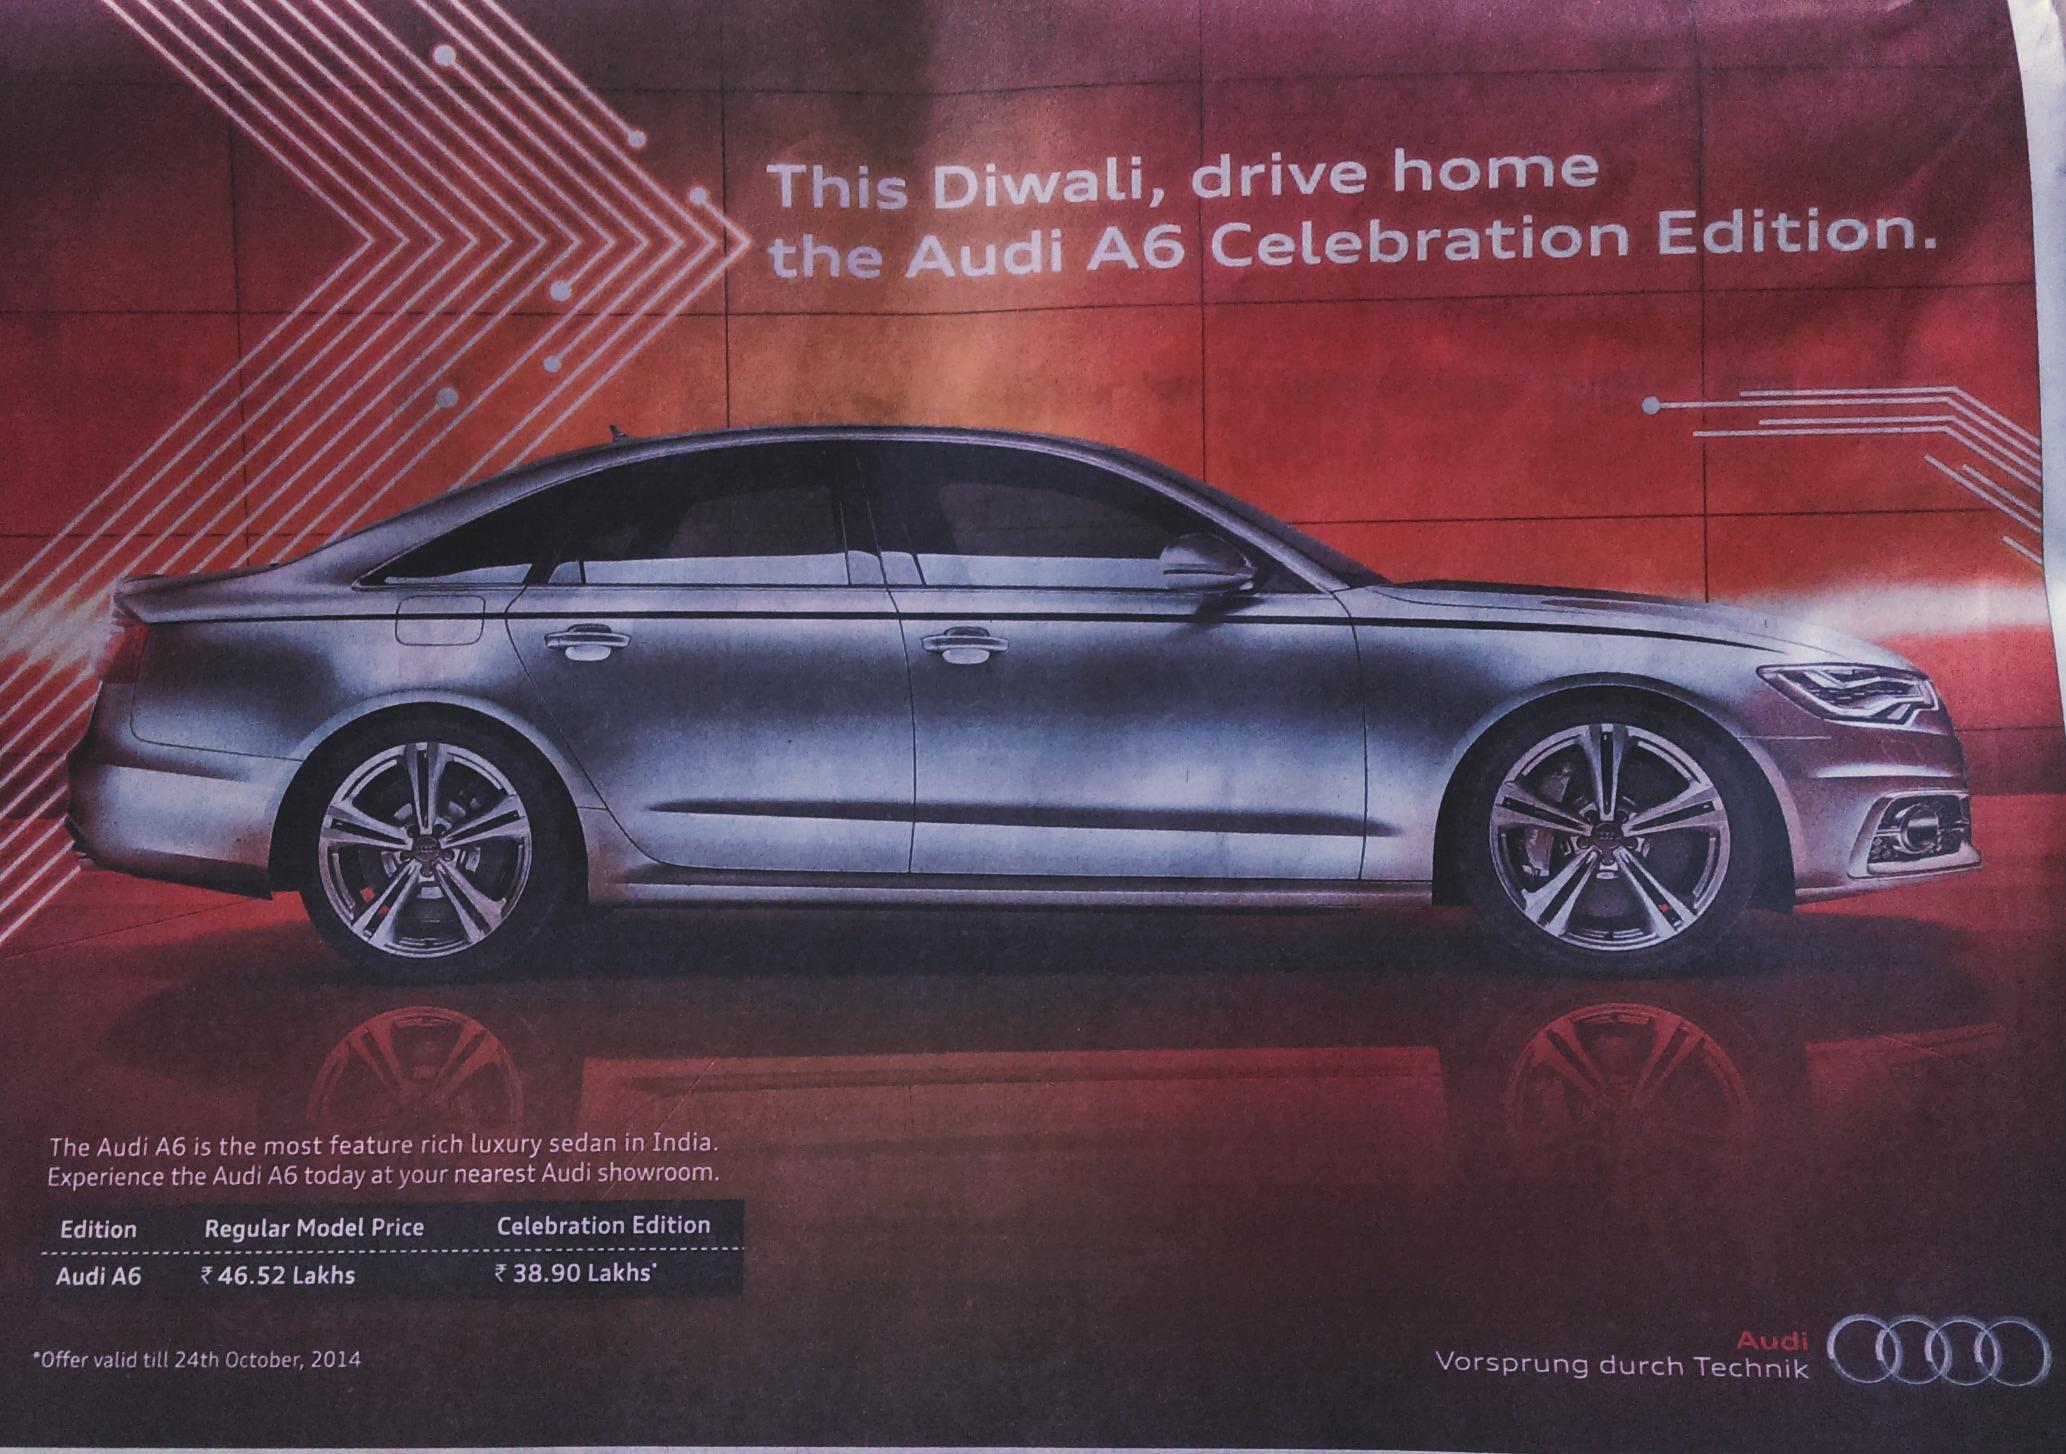 Audi launches A6 celebration edition